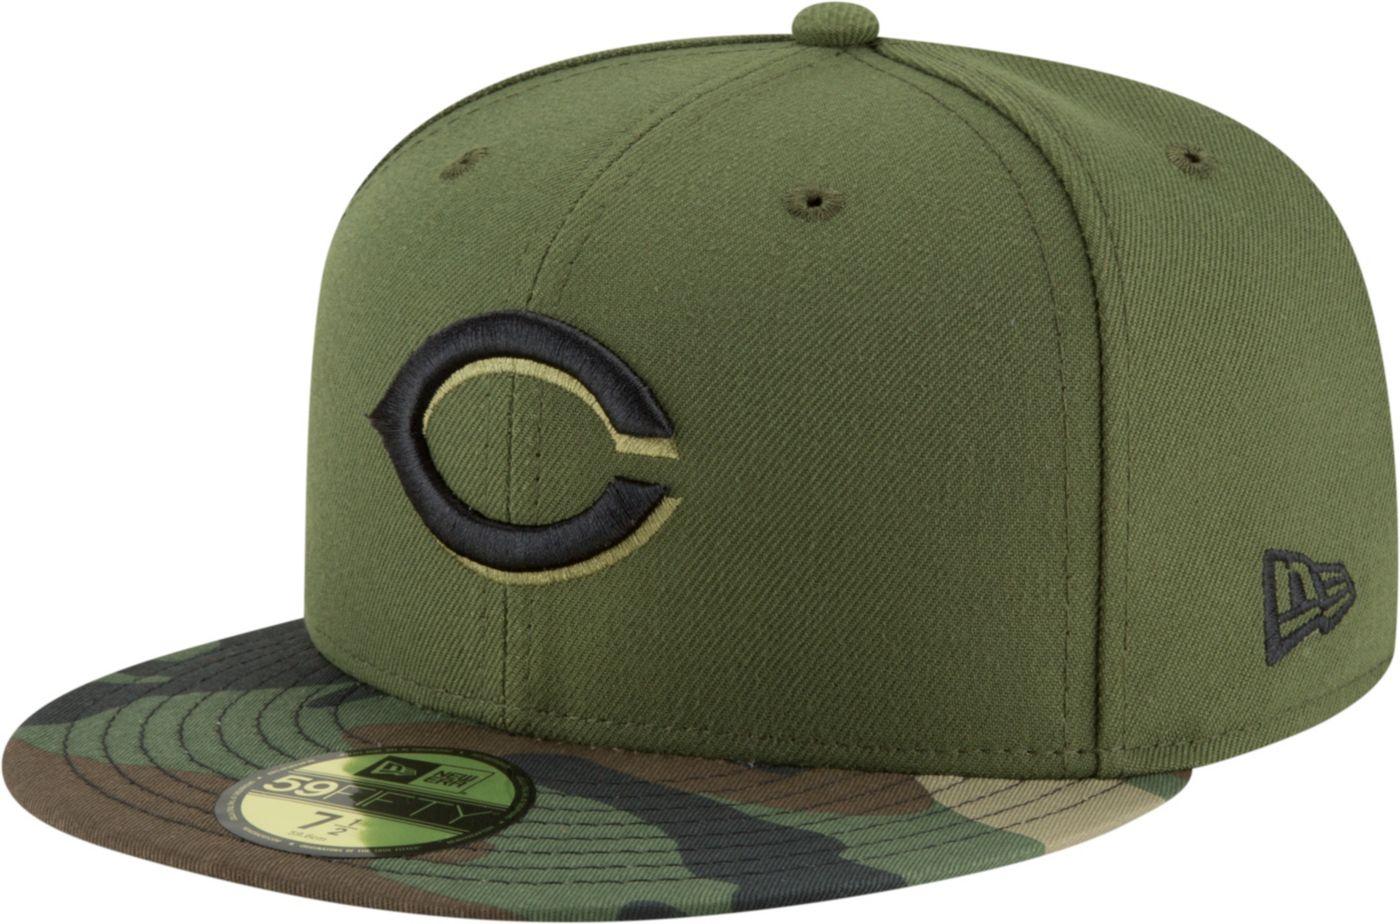 New Era Men's Cincinnati Reds 59Fifty Alternate Camo Authentic Hat